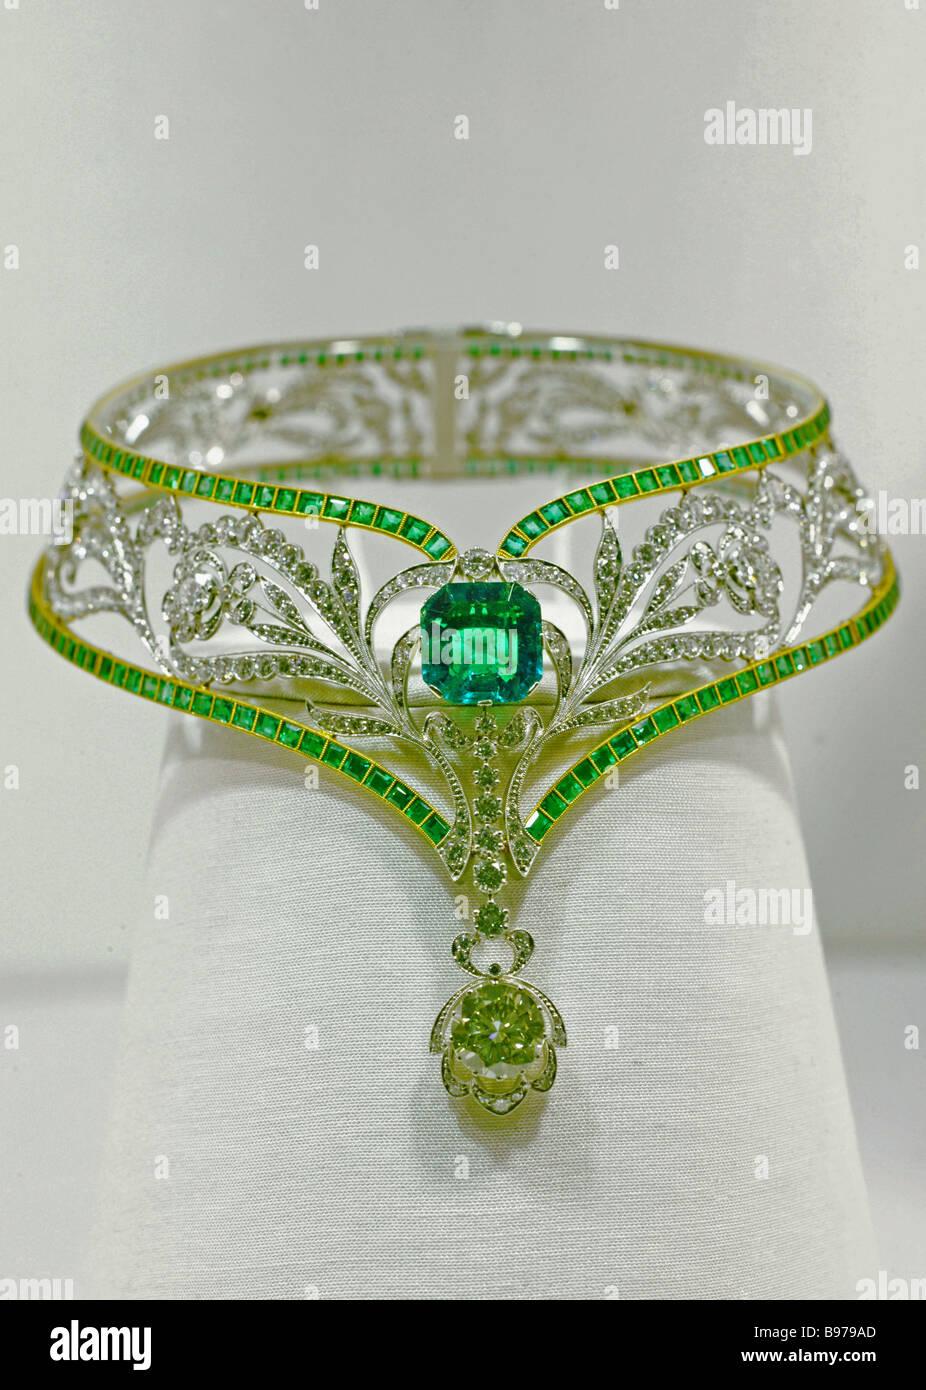 Jewelers Stock Photos & Jewelers Stock Images - Alamy